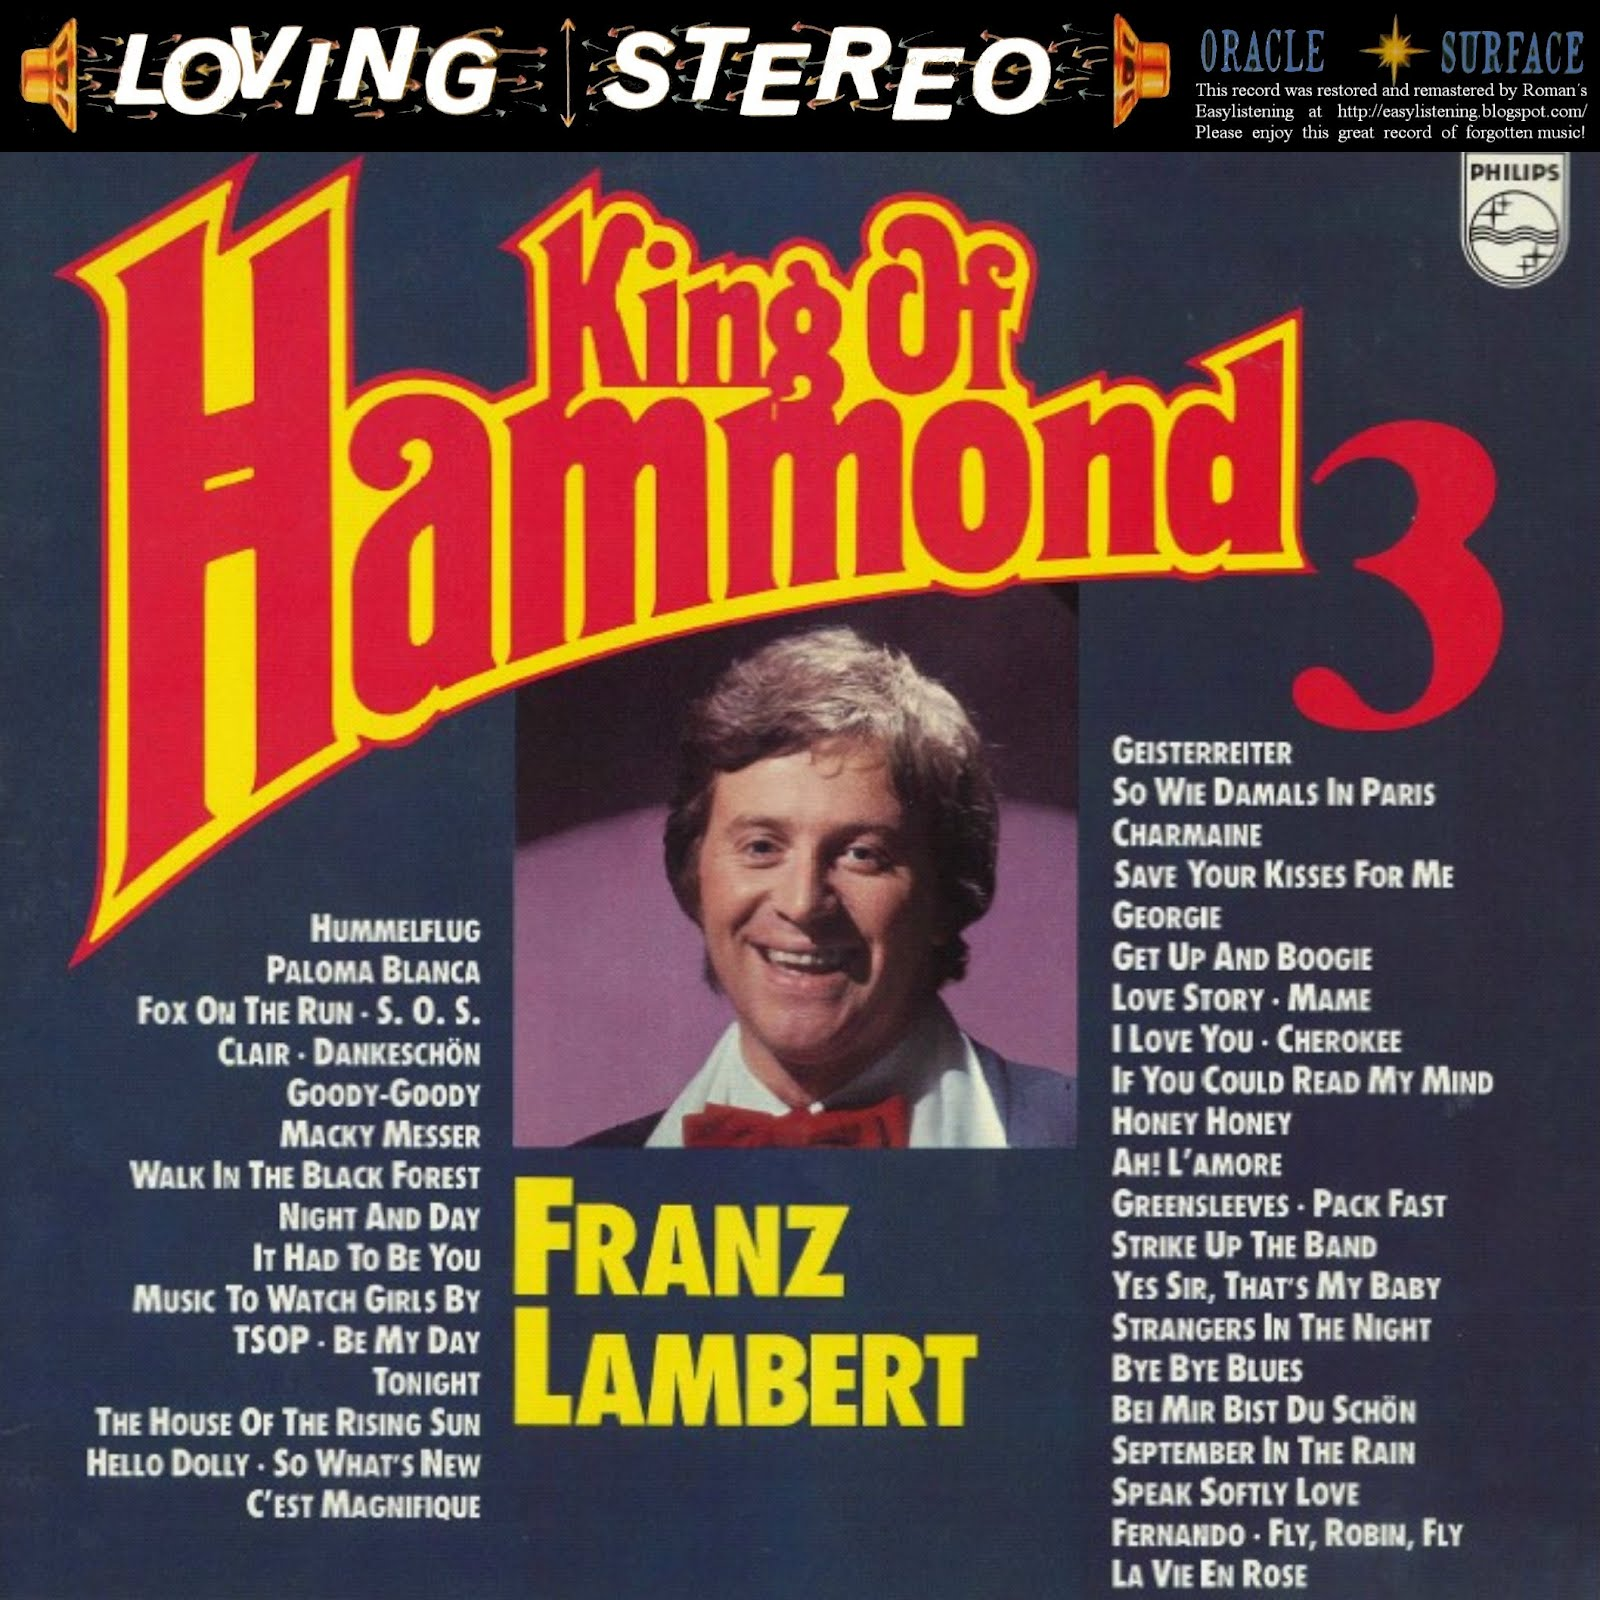 Franz Lambert - Hammond Hitparade 5